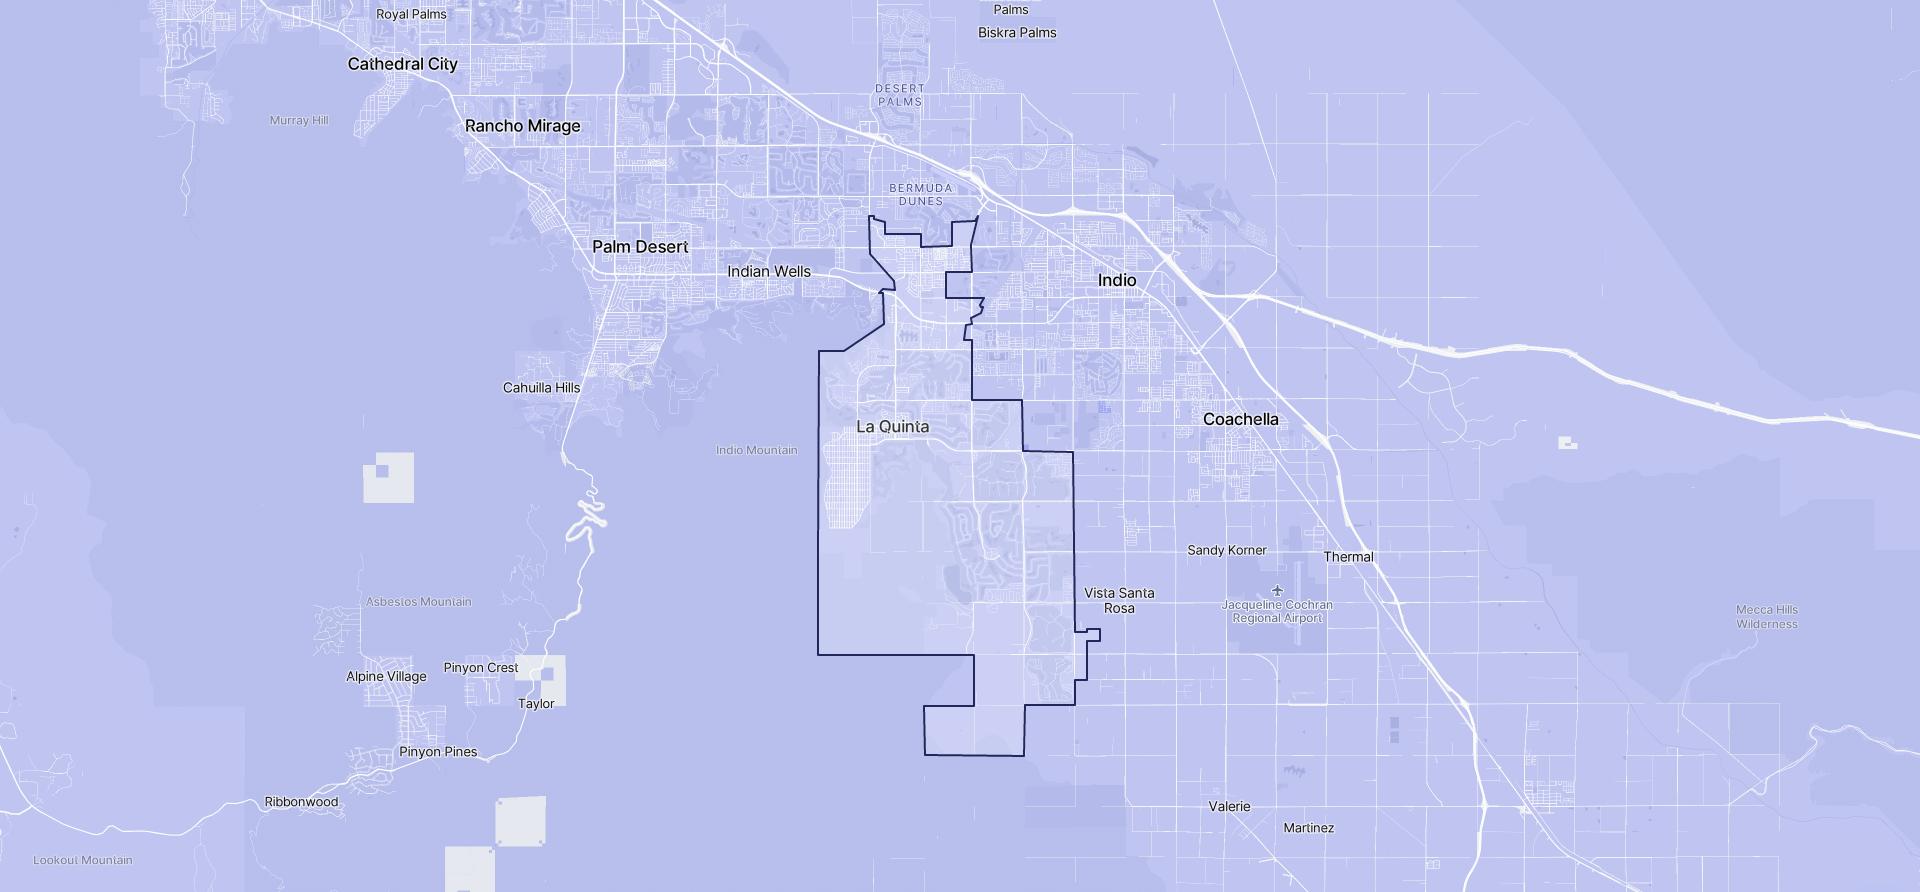 Image of La Quinta boundaries on a map.